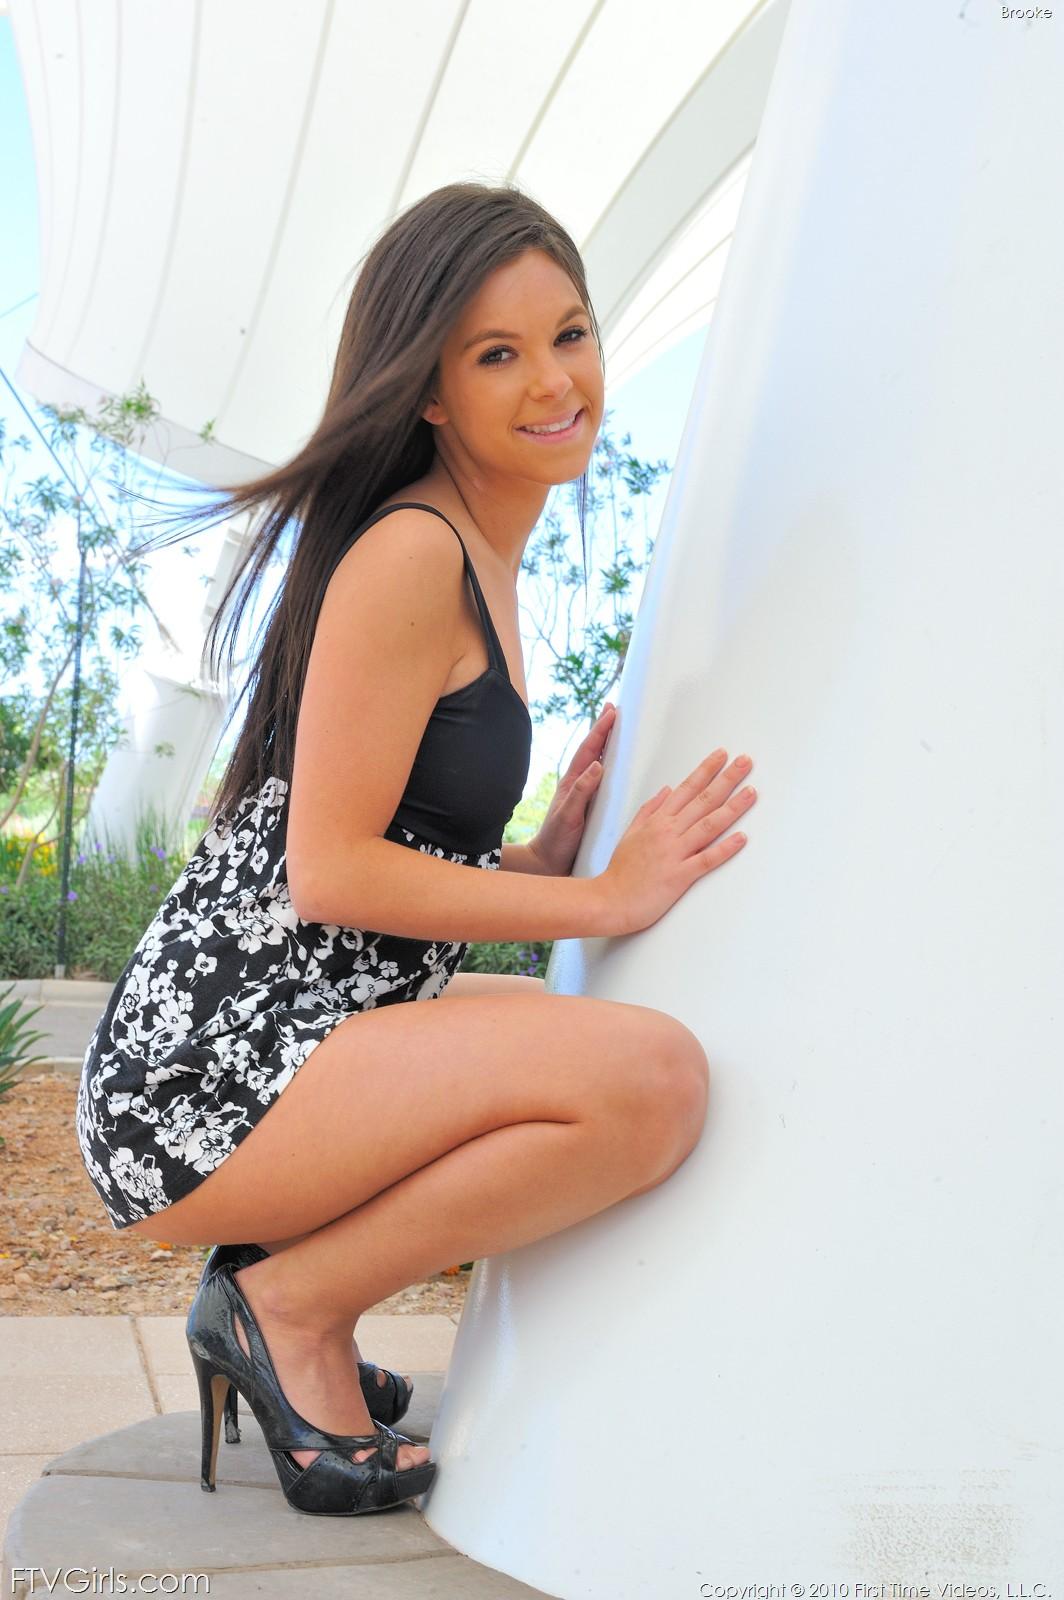 up shorts peek Girl